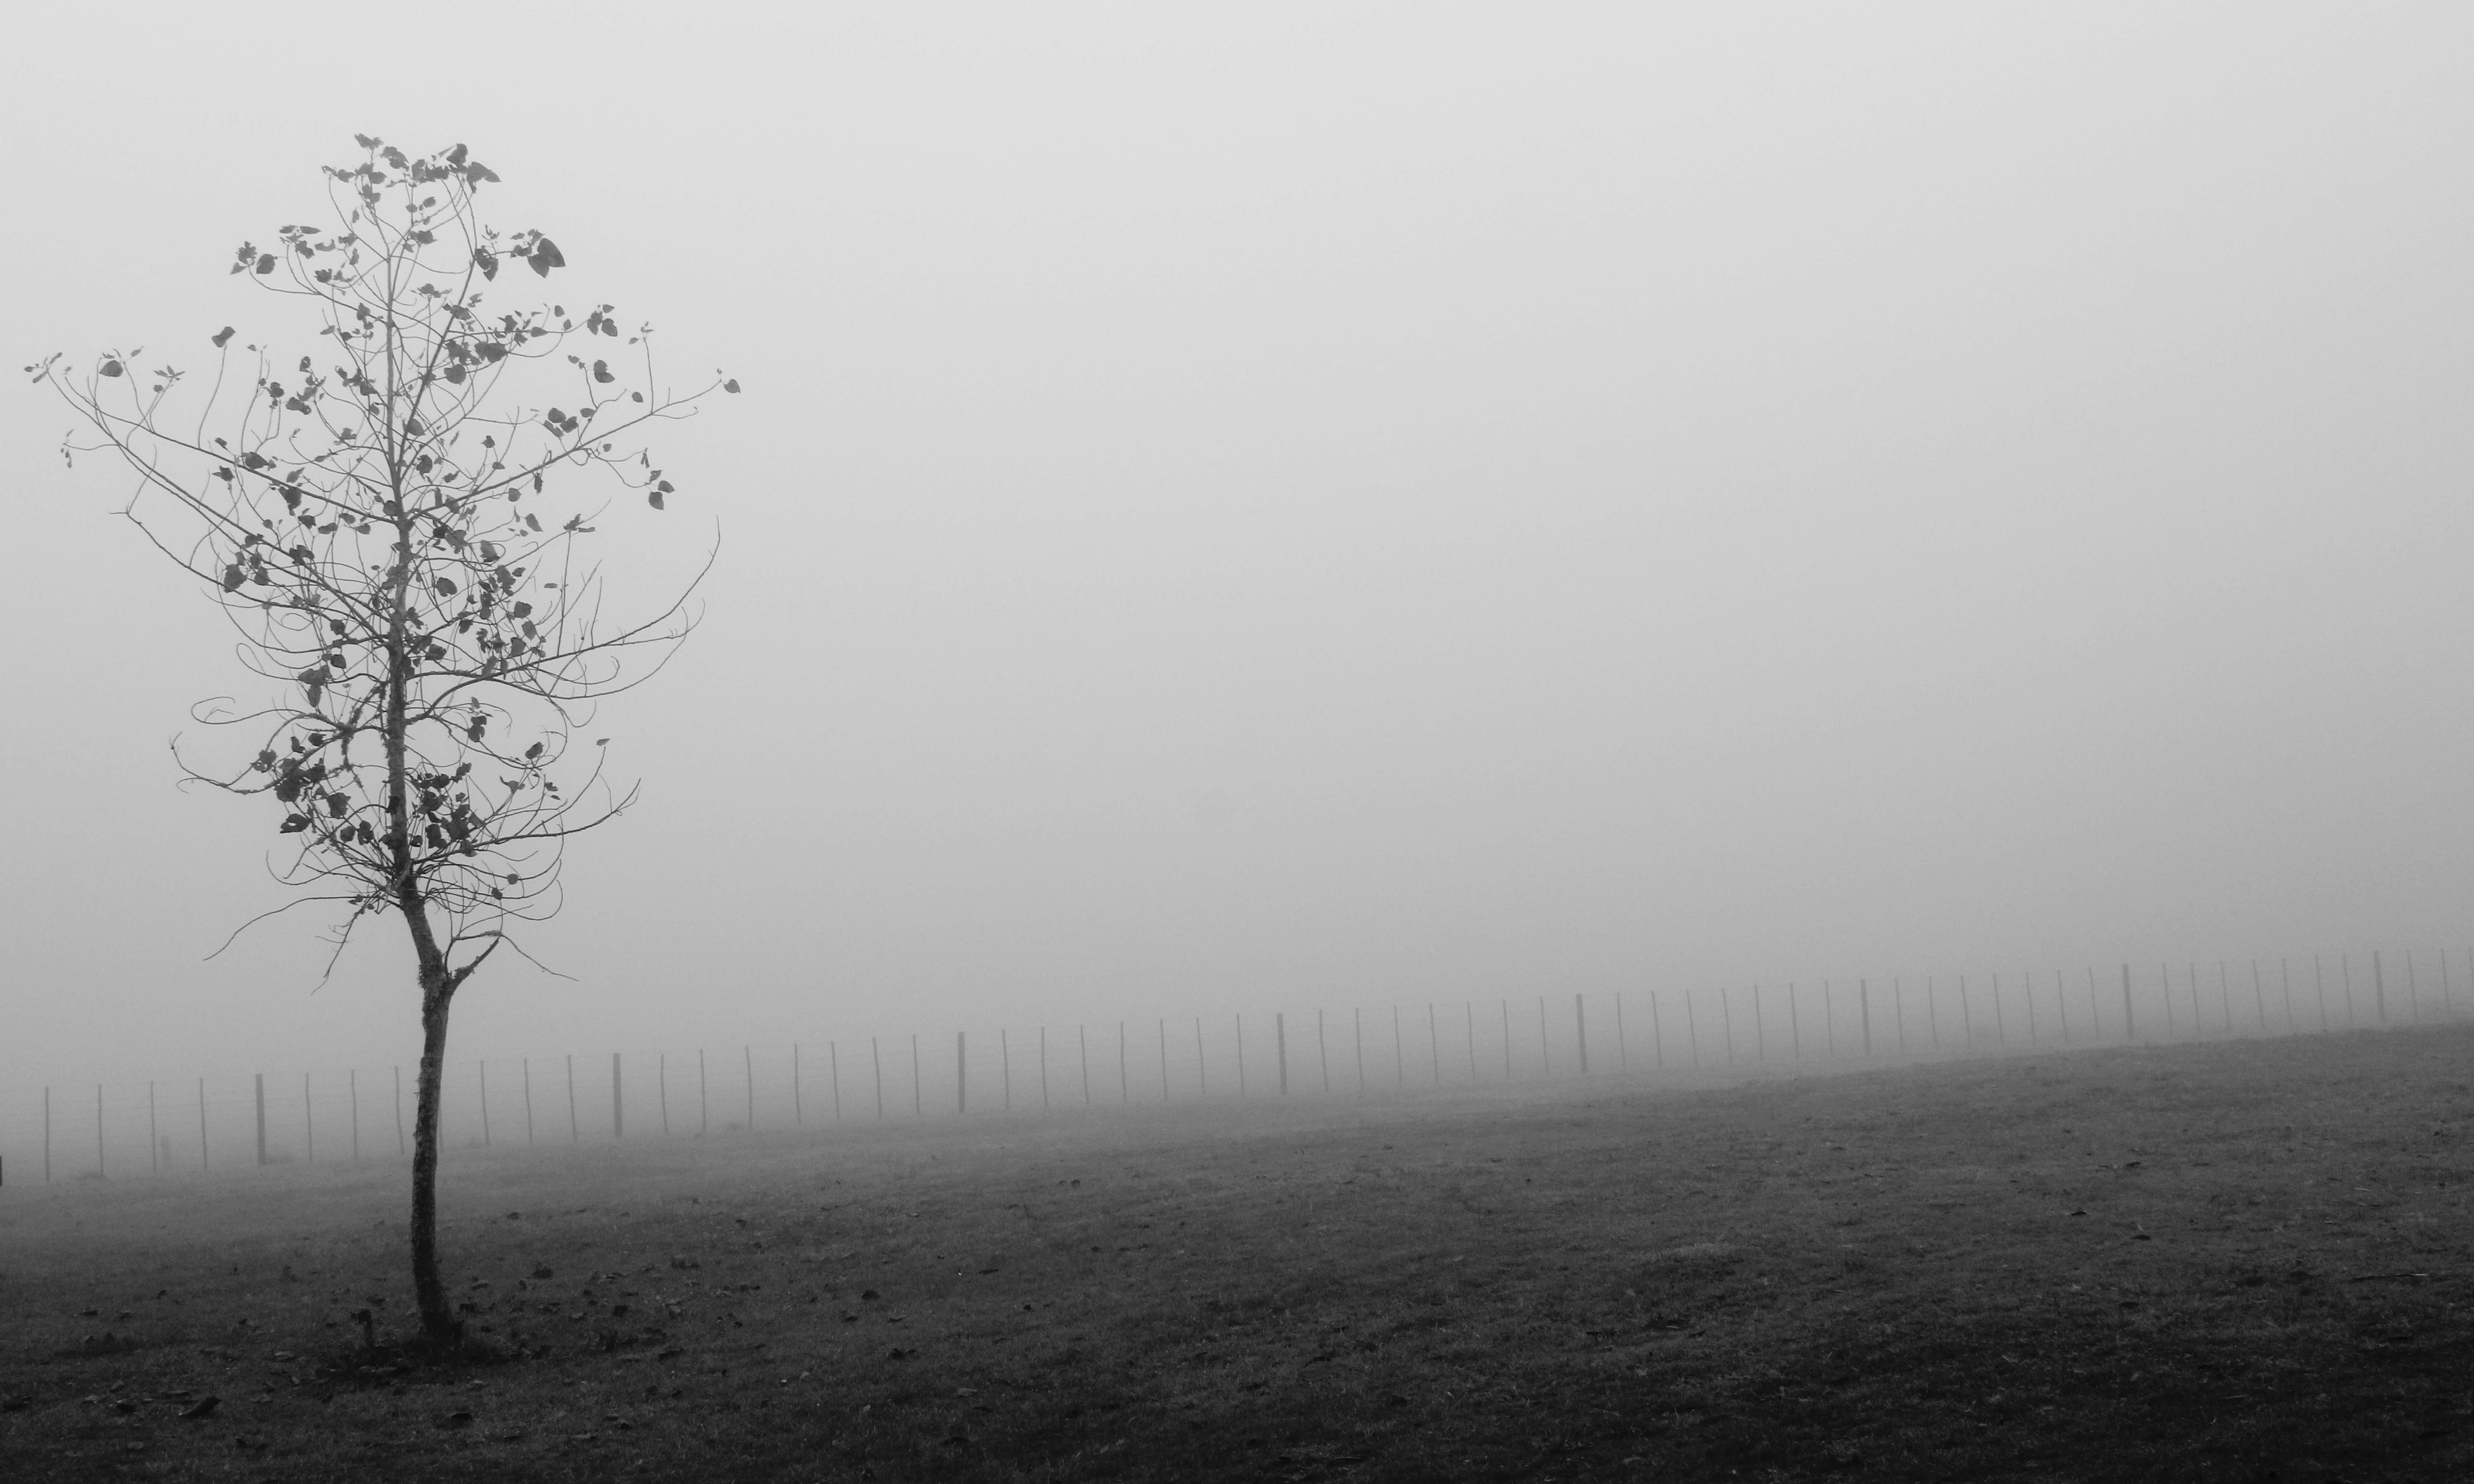 A Cabin in the Fog